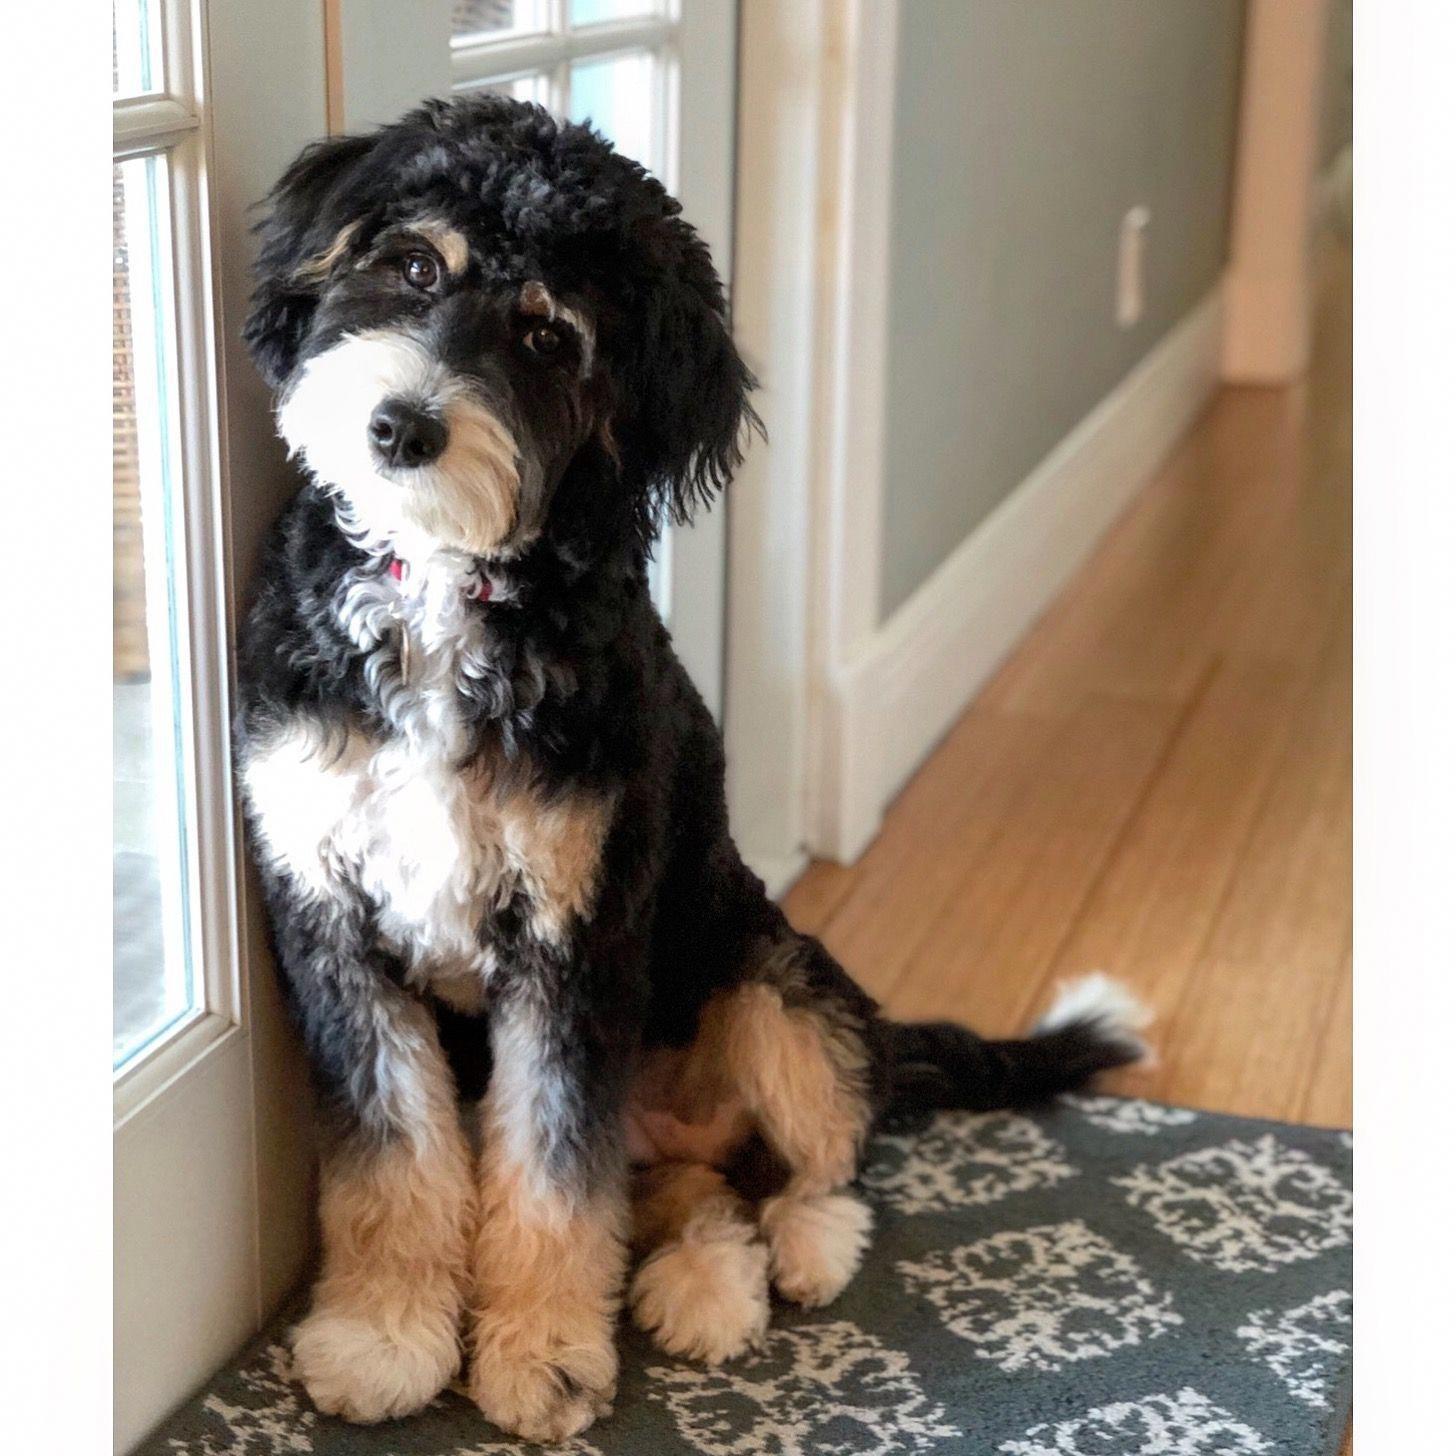 Mini bernedoodle #PoodlePup